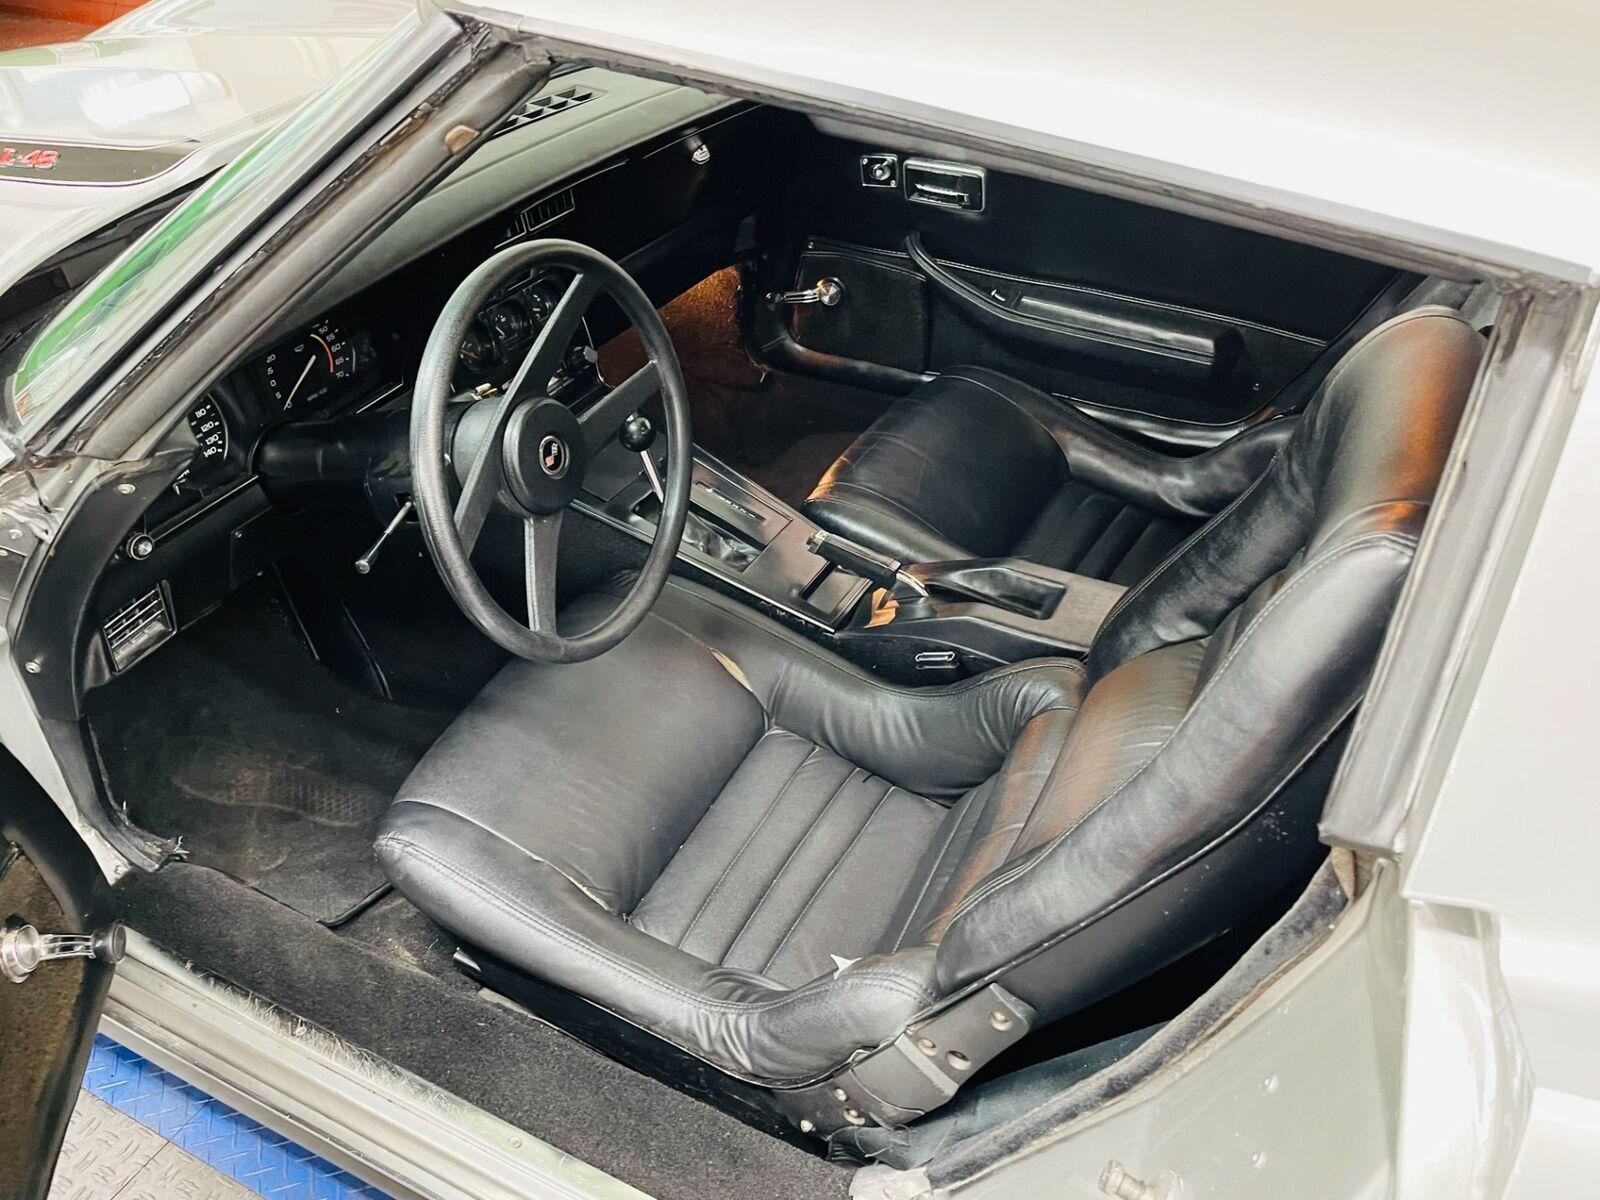 1979 Silver Chevrolet Corvette   | C3 Corvette Photo 7